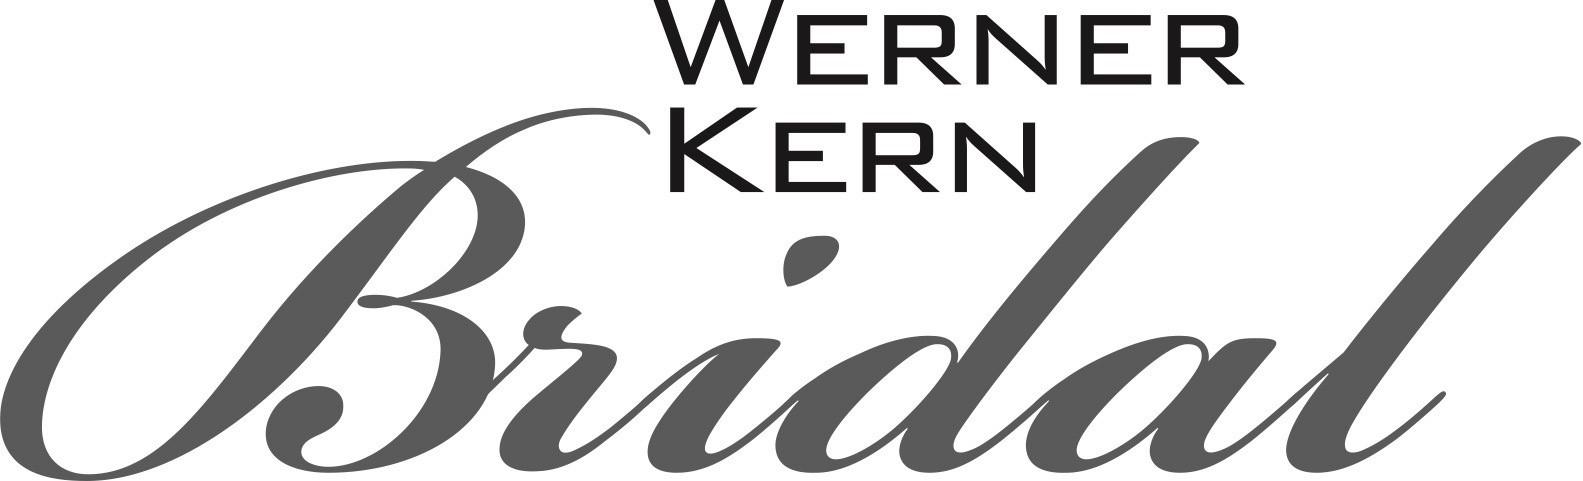 Werner Kern Bridal Logo